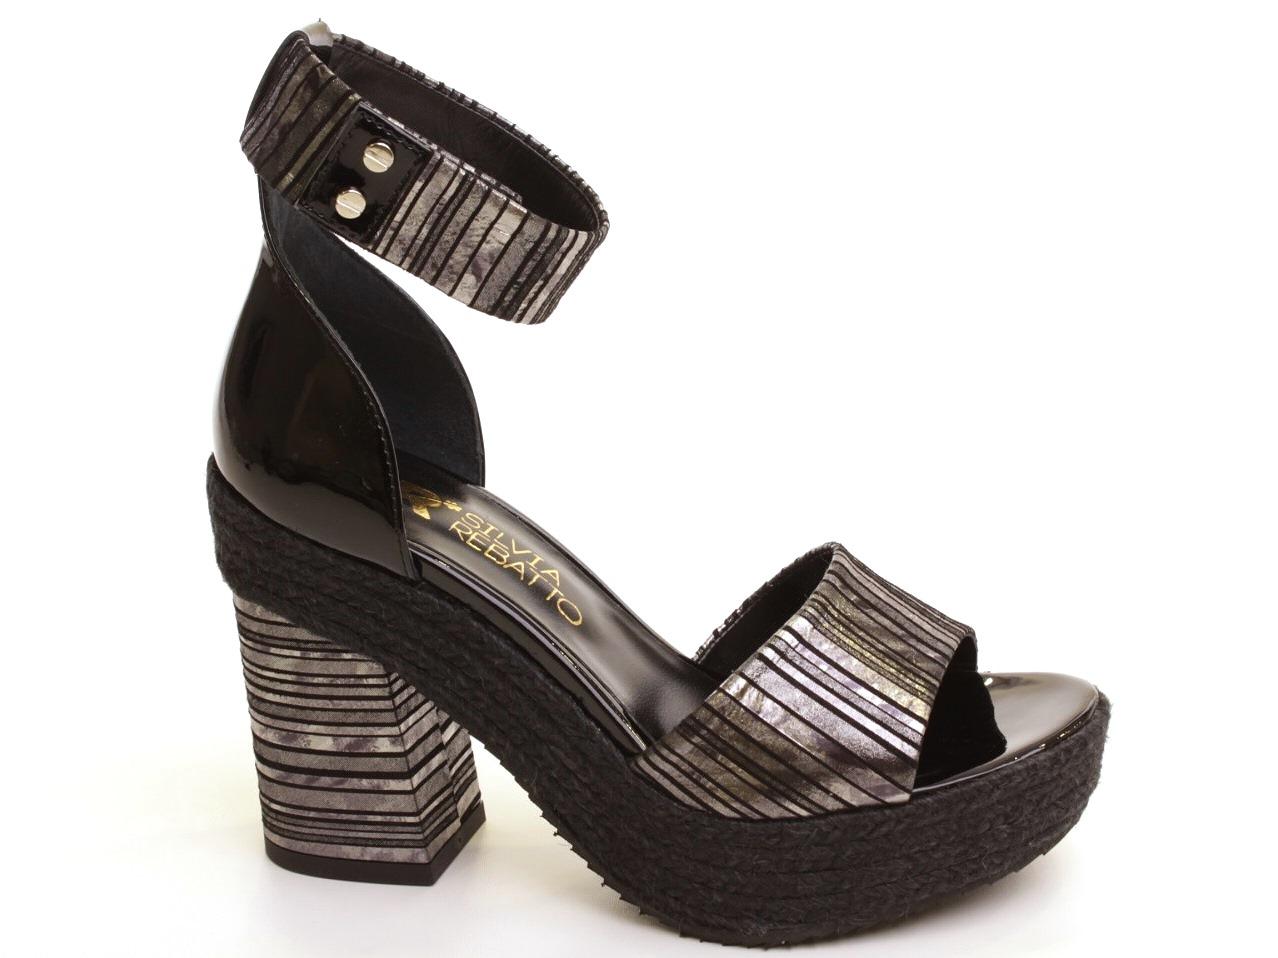 Sandales à talons Silvia Rebatto - 019 S9502